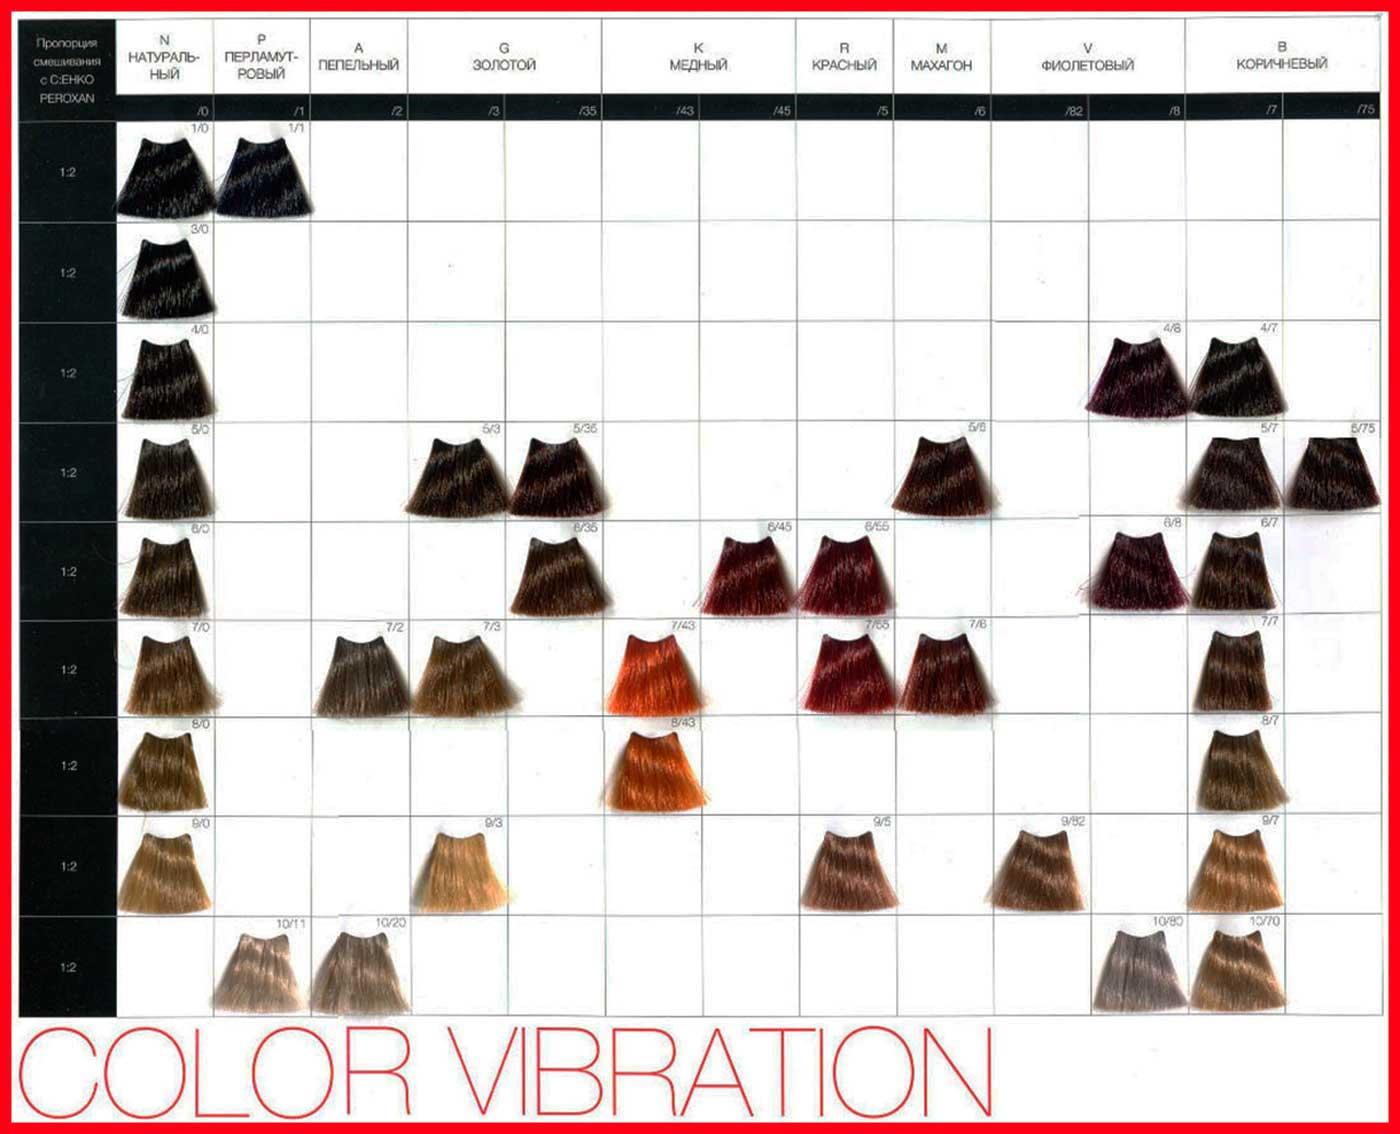 Палитра Цеко Колор Вибрейшн Cehko Color Vibration Palette